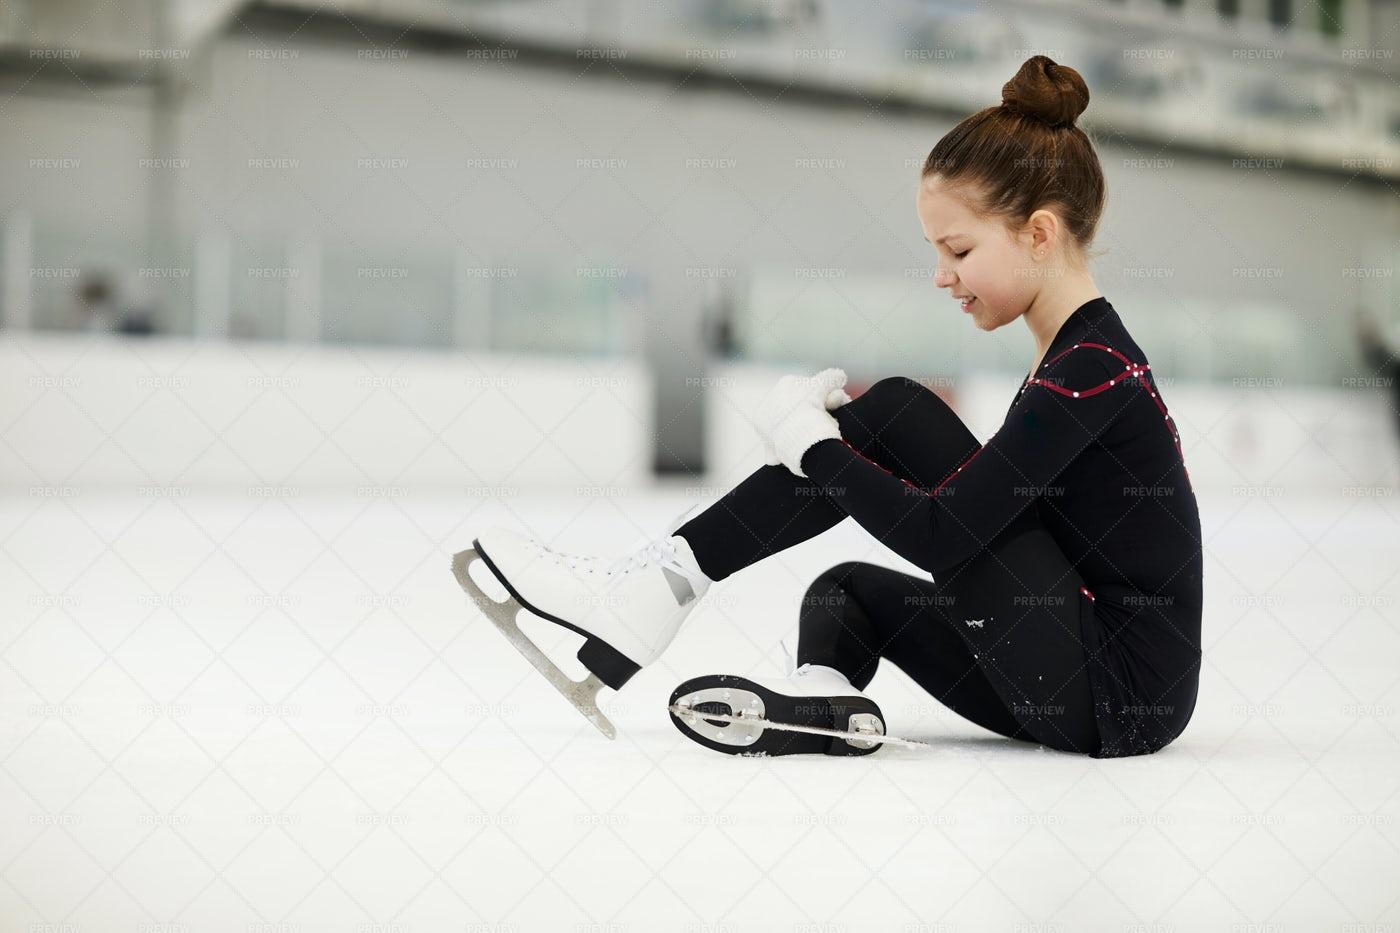 Injured Girl On Ice Rink: Stock Photos